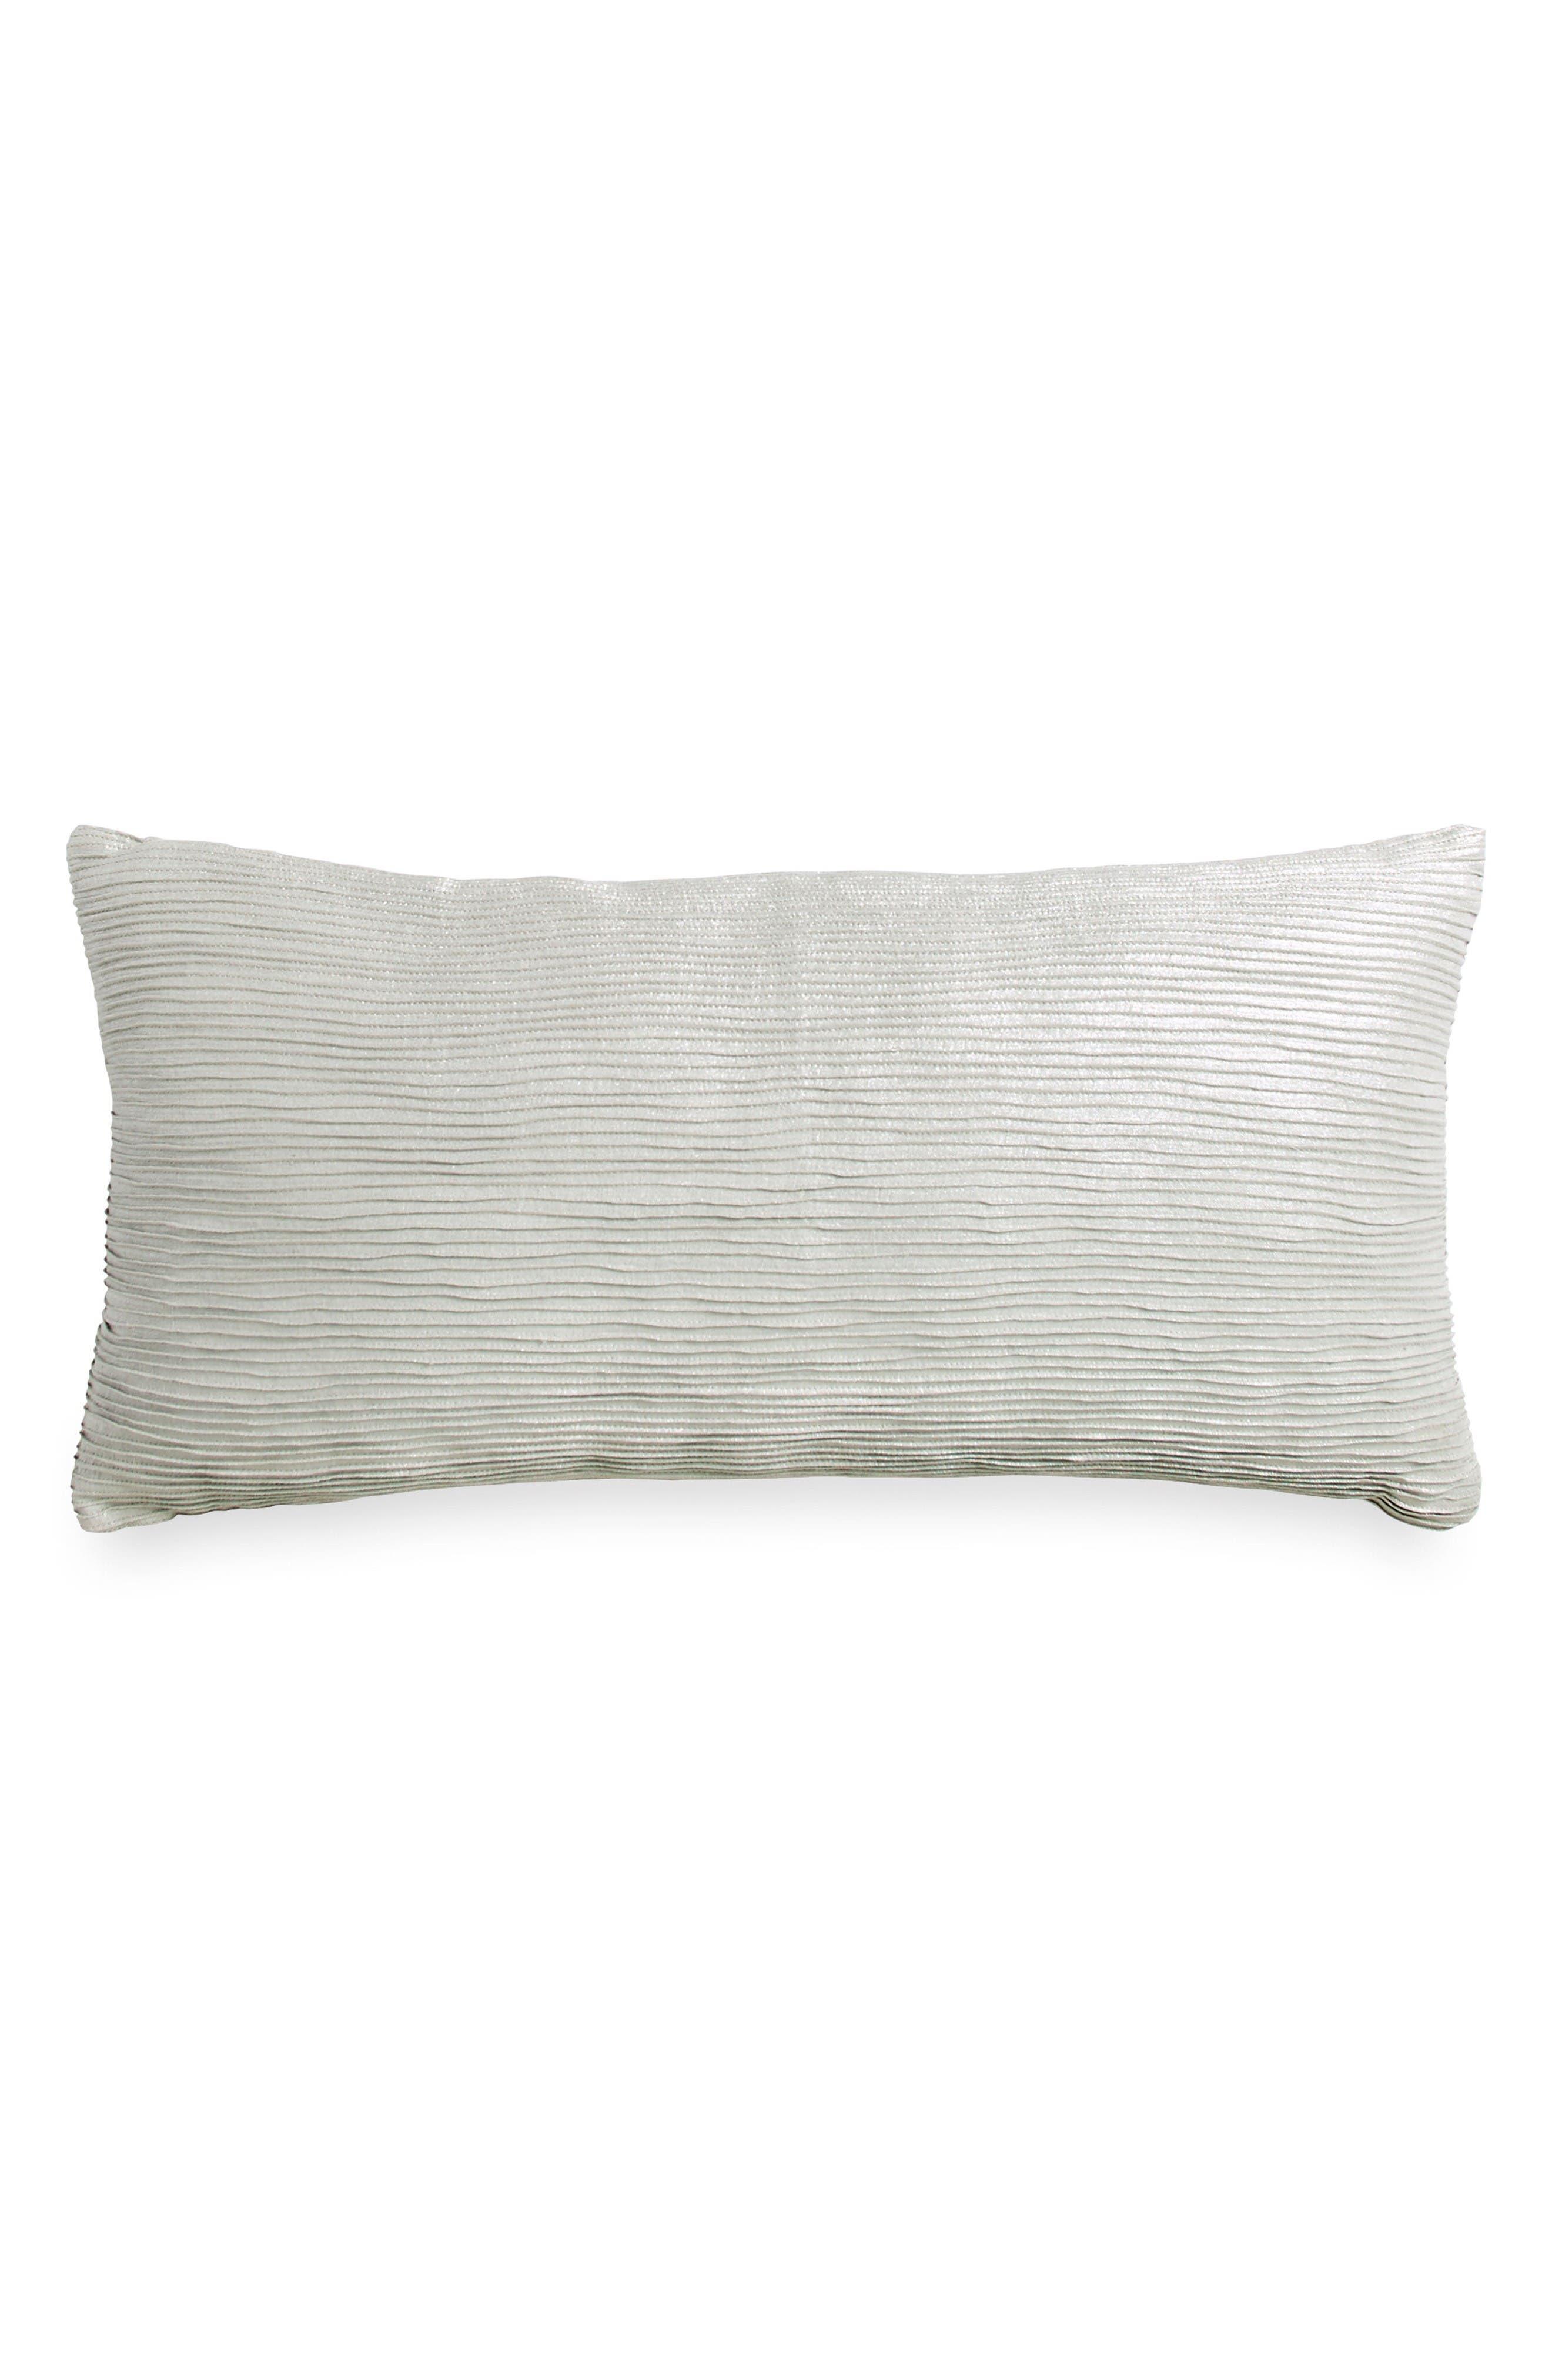 Tidal Accent Pillow,                             Main thumbnail 1, color,                             Silver